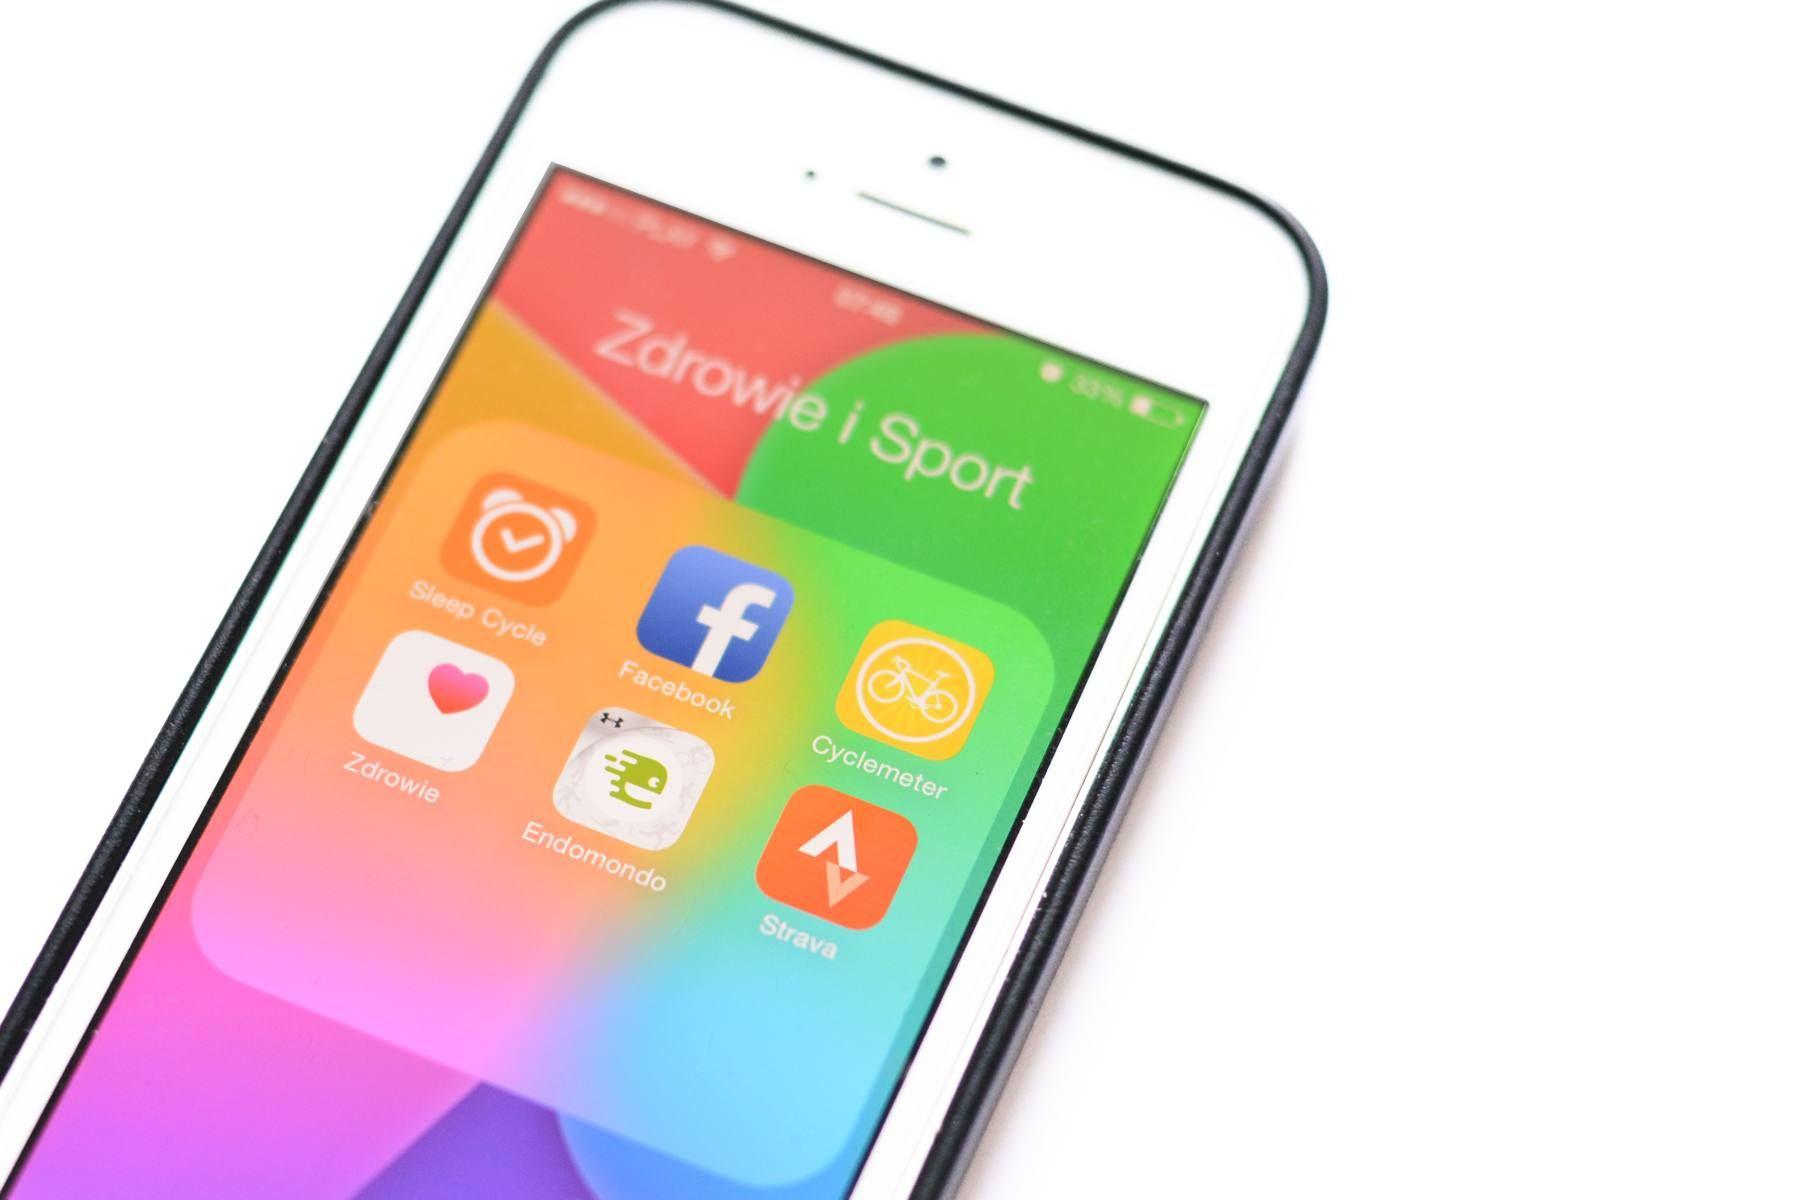 Strava Endomondo i Social Media